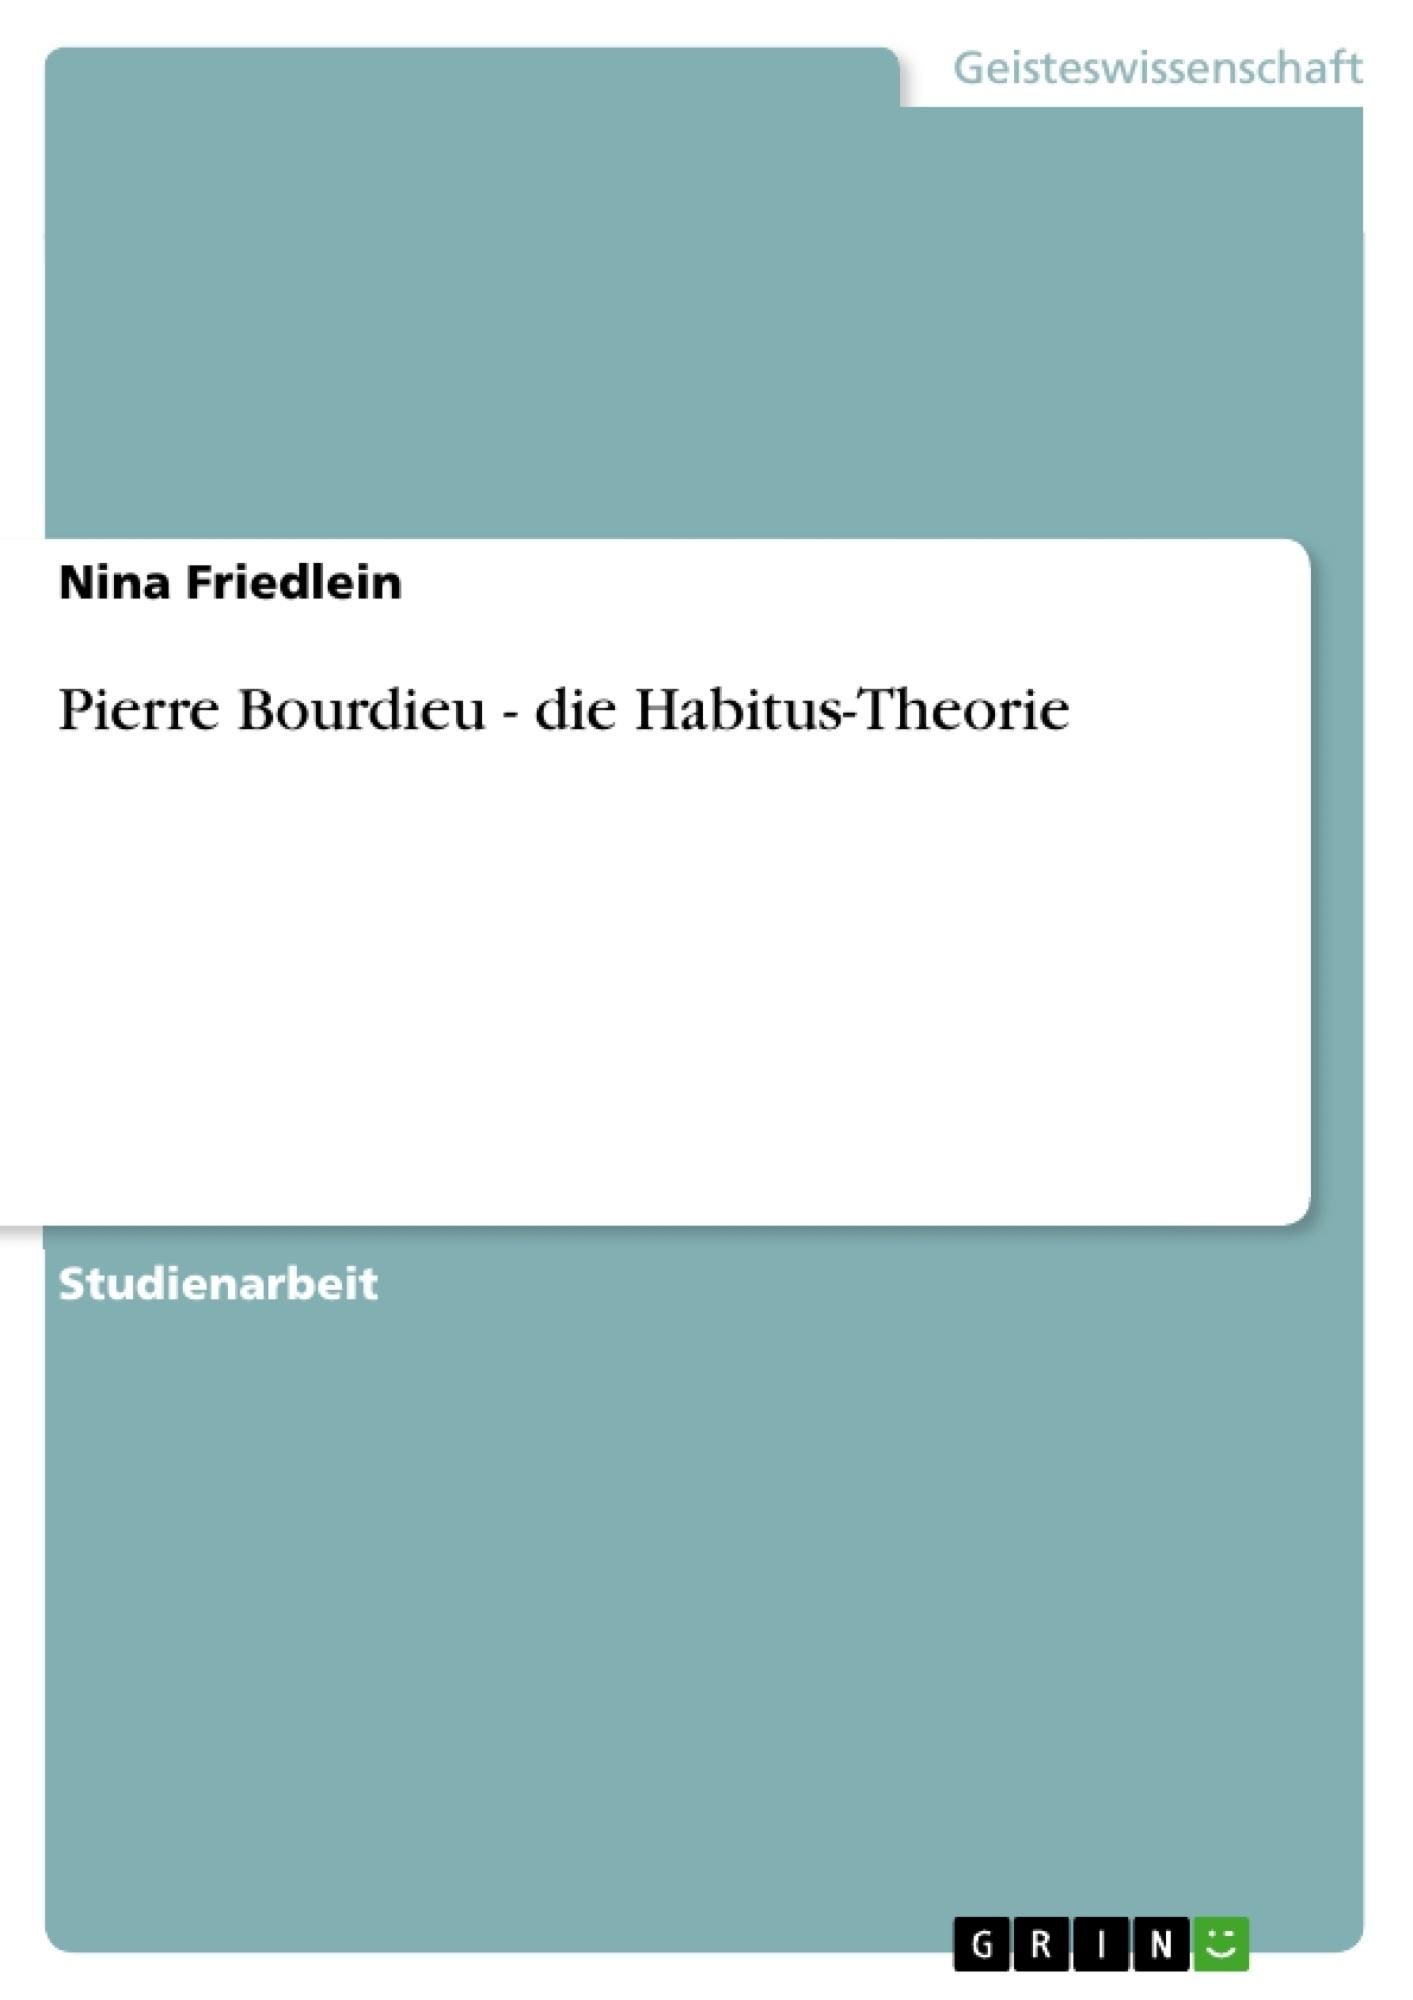 Titel: Pierre Bourdieu - die Habitus-Theorie